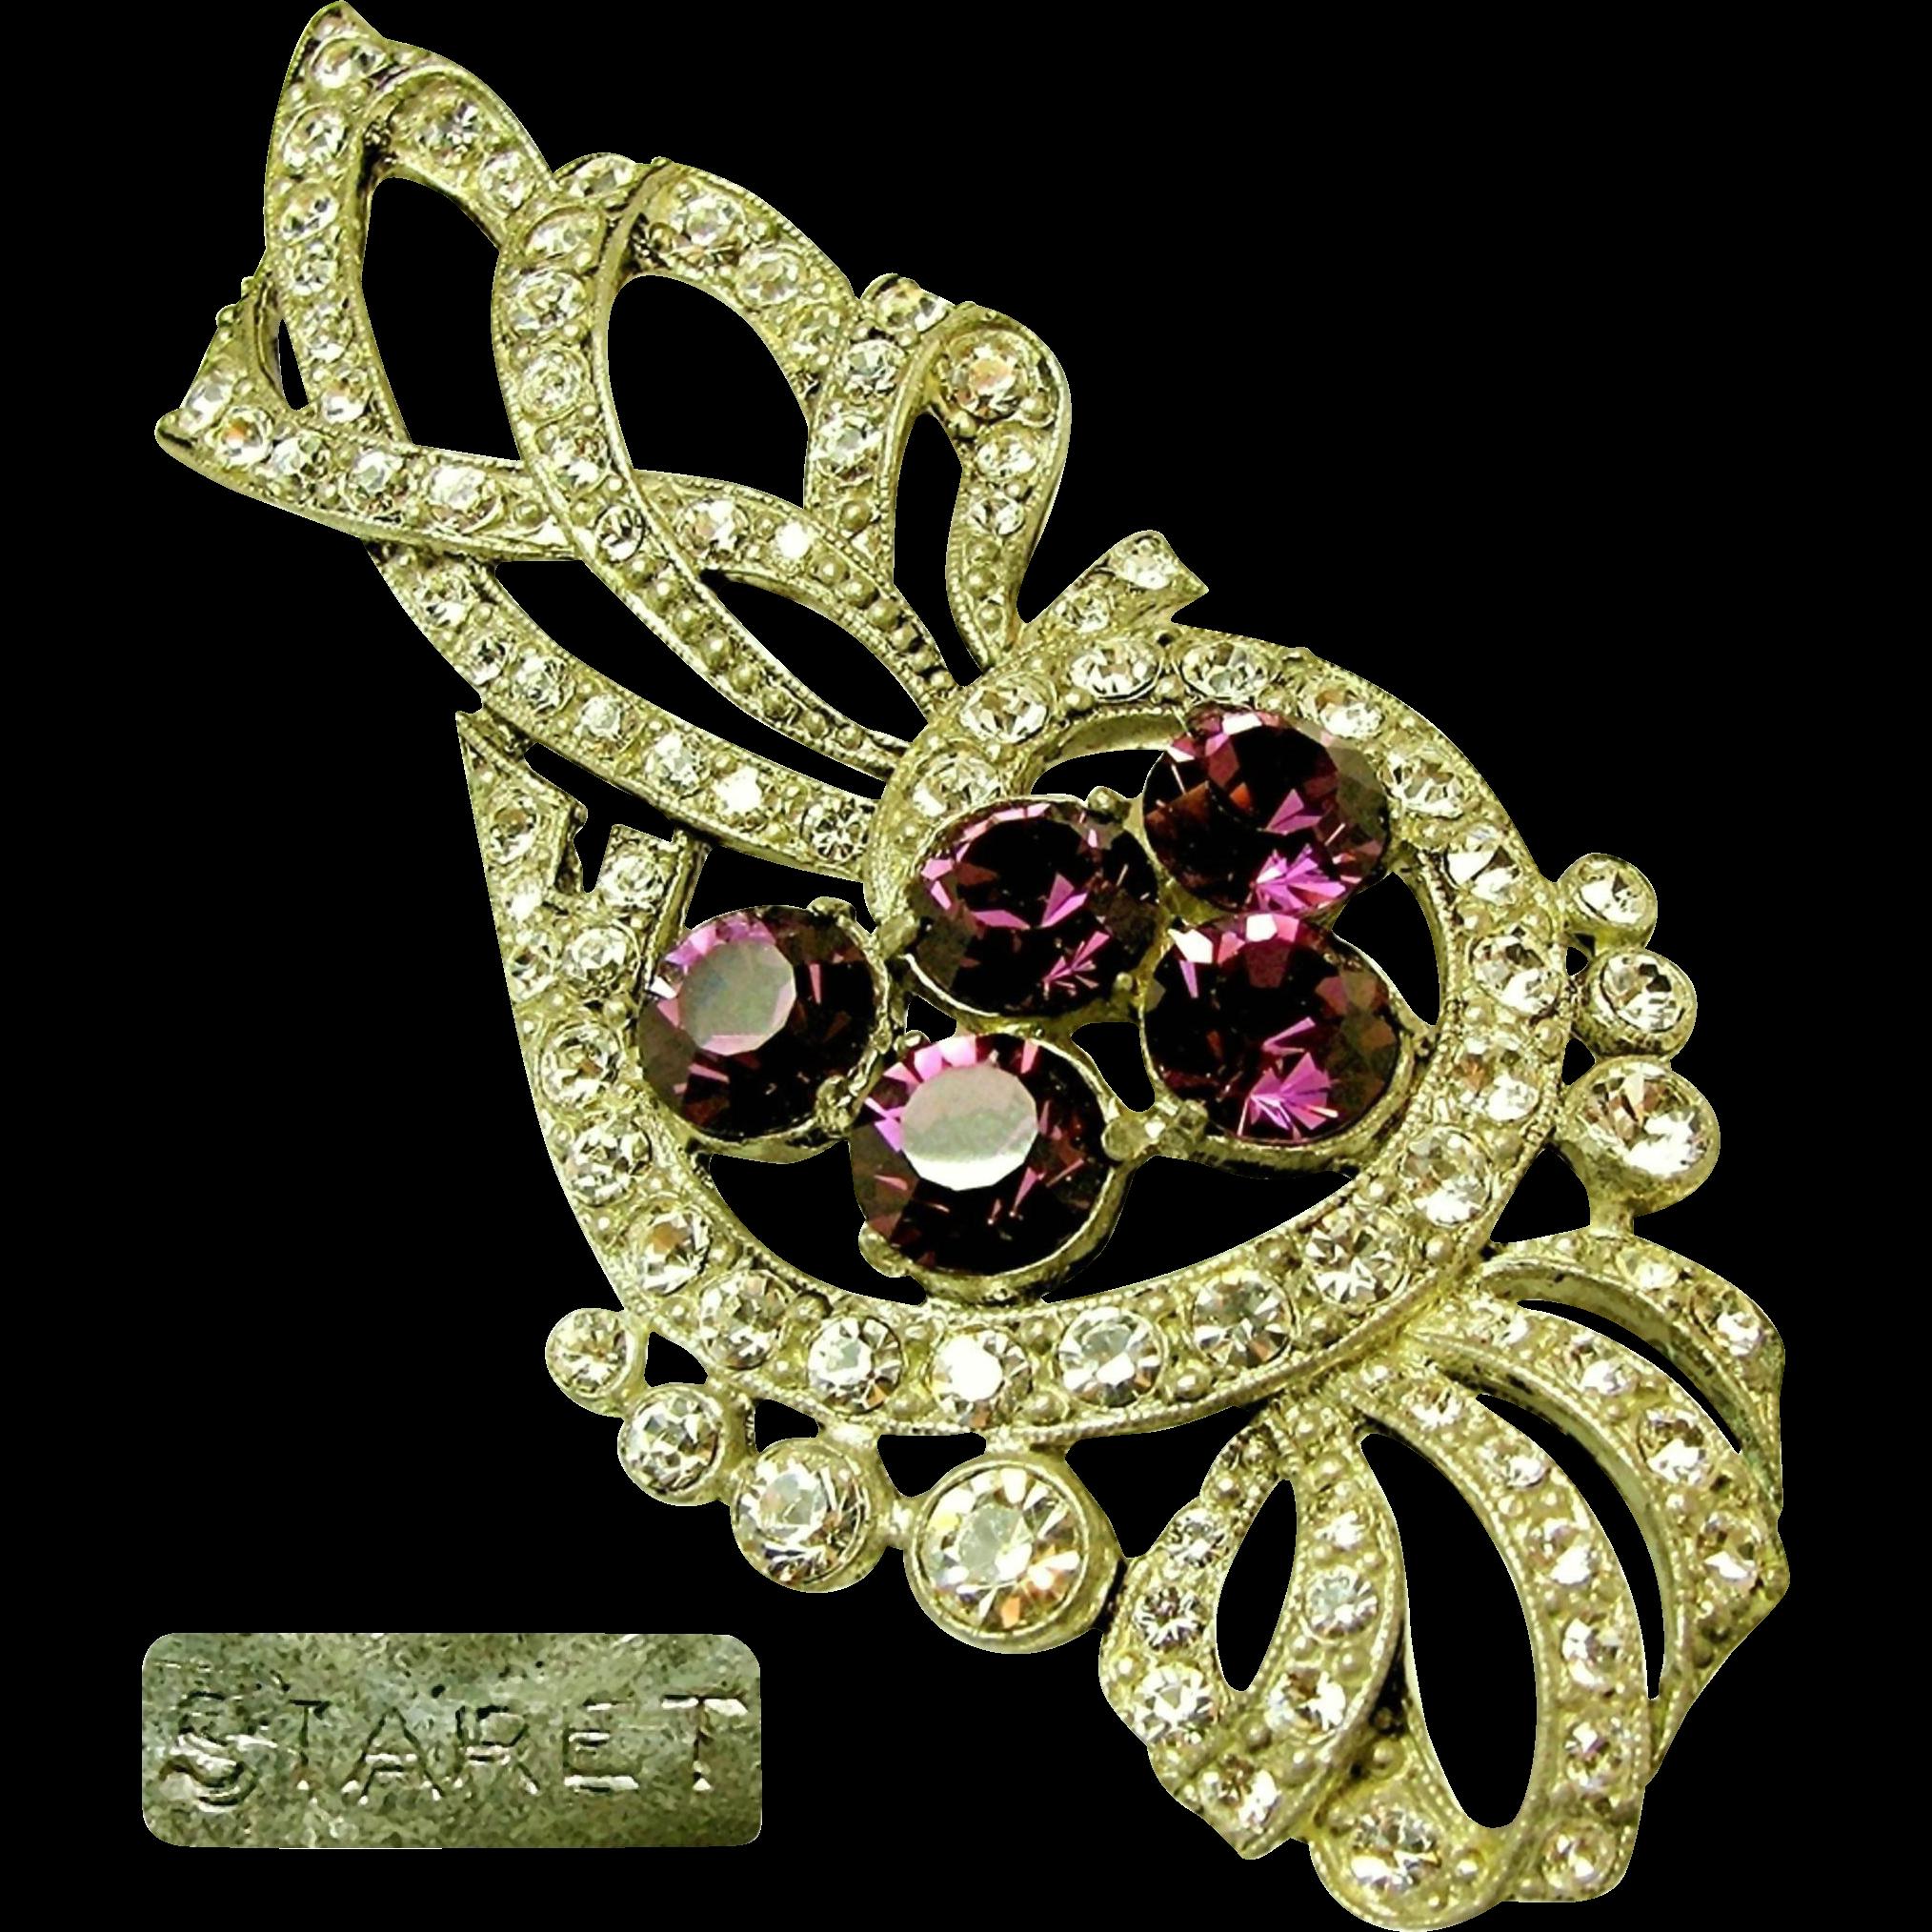 Lg. STARET Bow Brooch Clear White & Purple Rhinestones c.1940